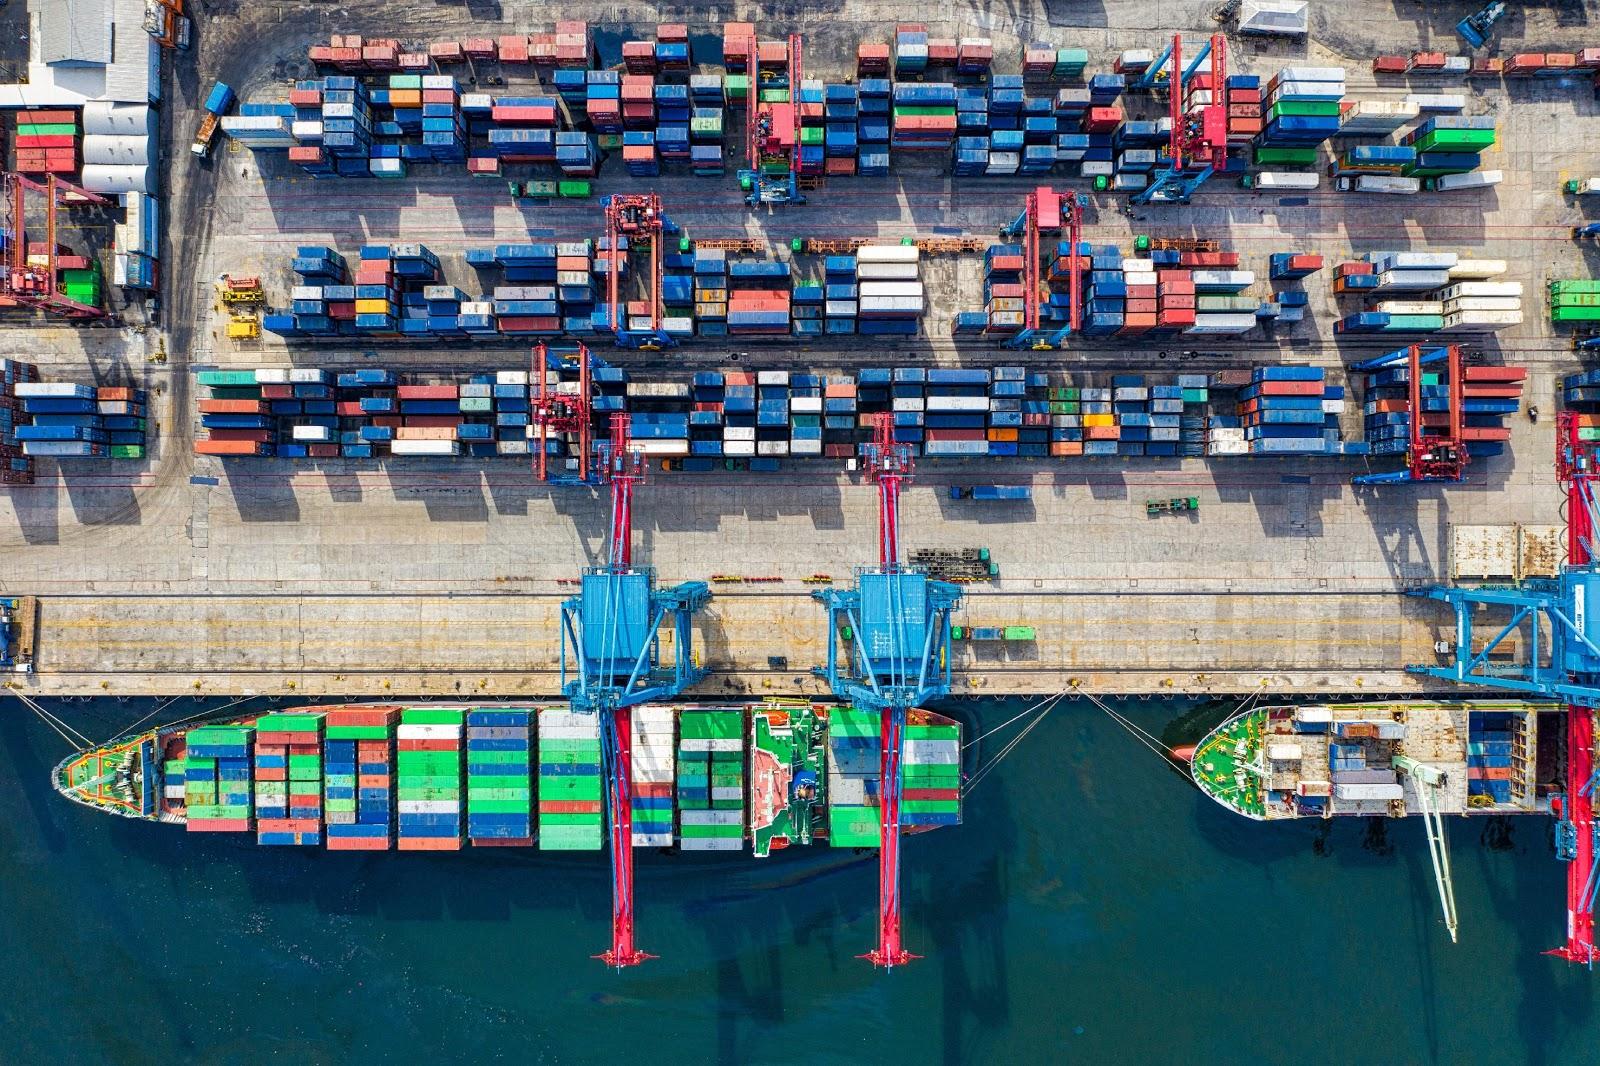 Working around the disruption of supply chain